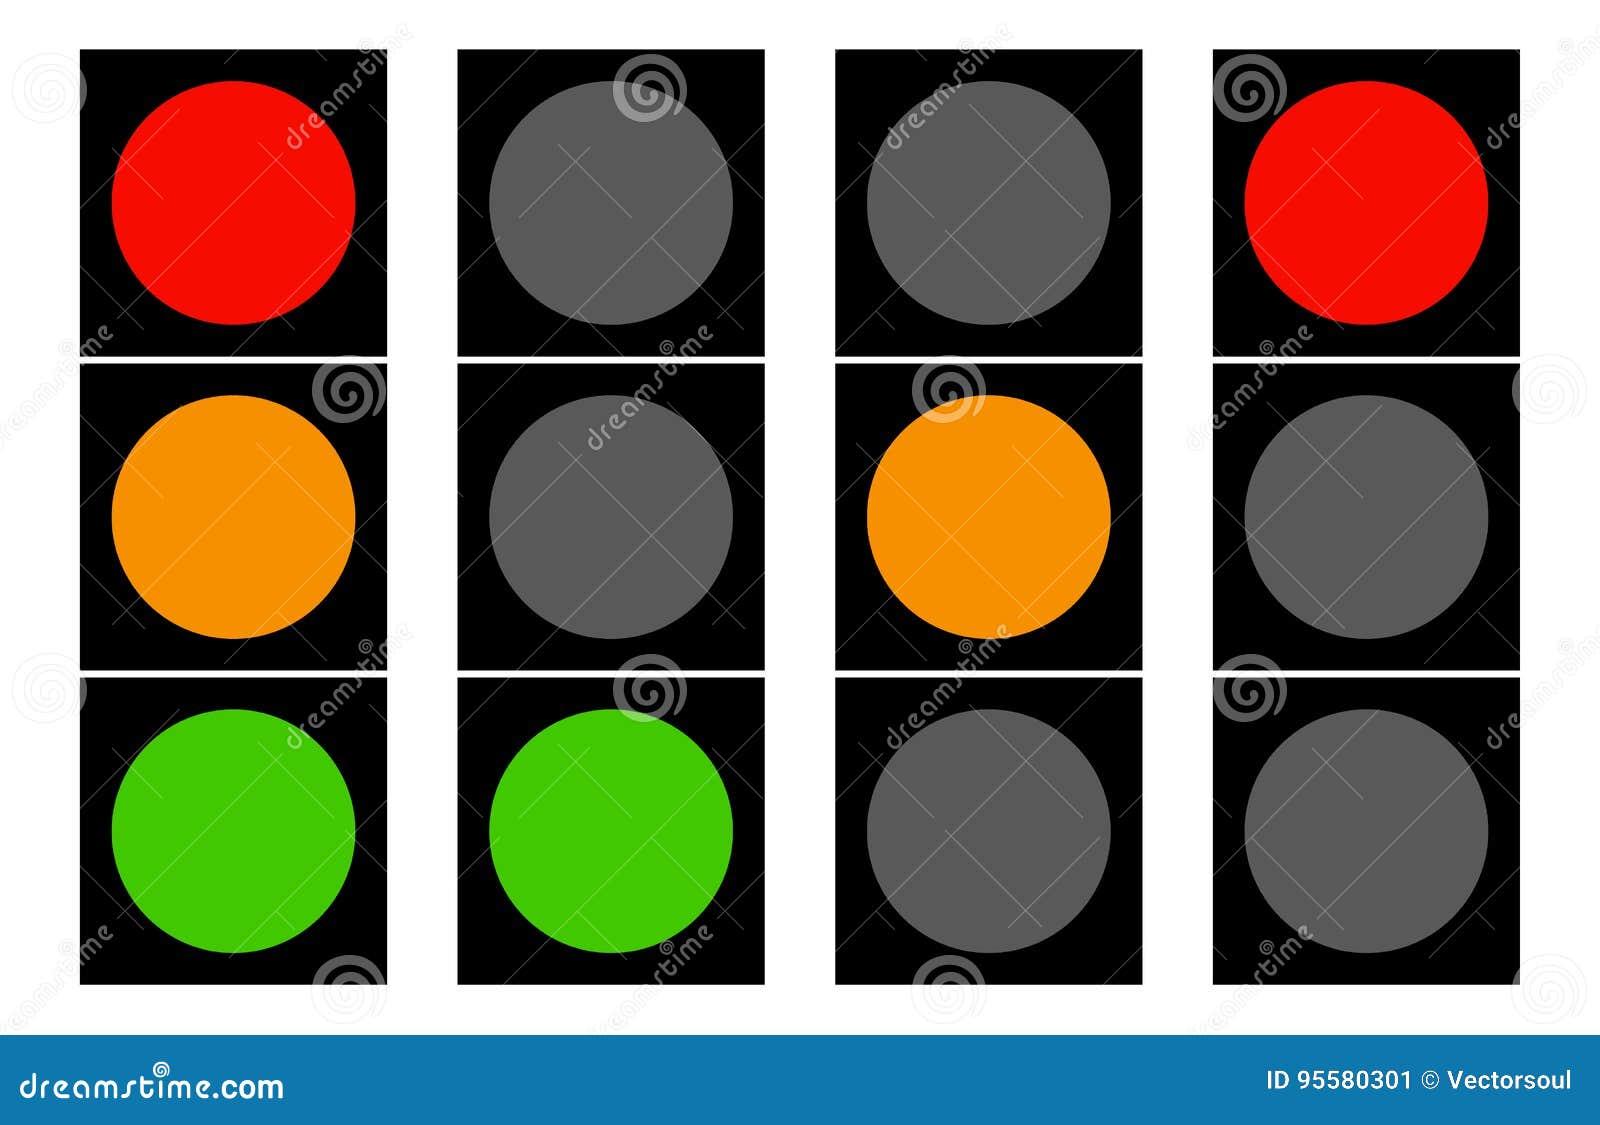 Elegant Download Flat Traffic Light Icons. Traffic Lamps, Semaphore Stock Vector    Illustration Of Abstract Amazing Design